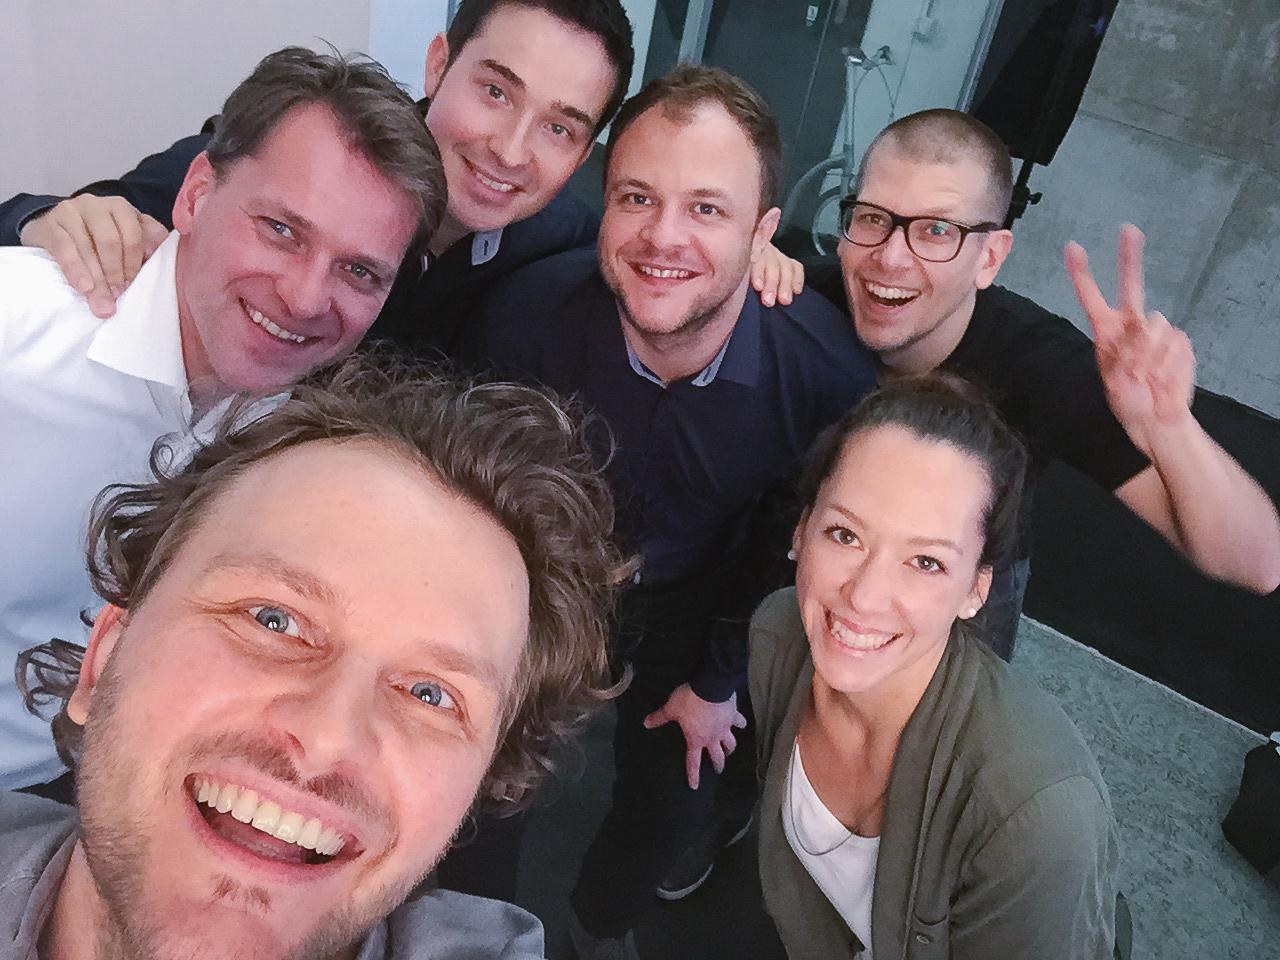 Teamfoto Startup Berlin Selfie